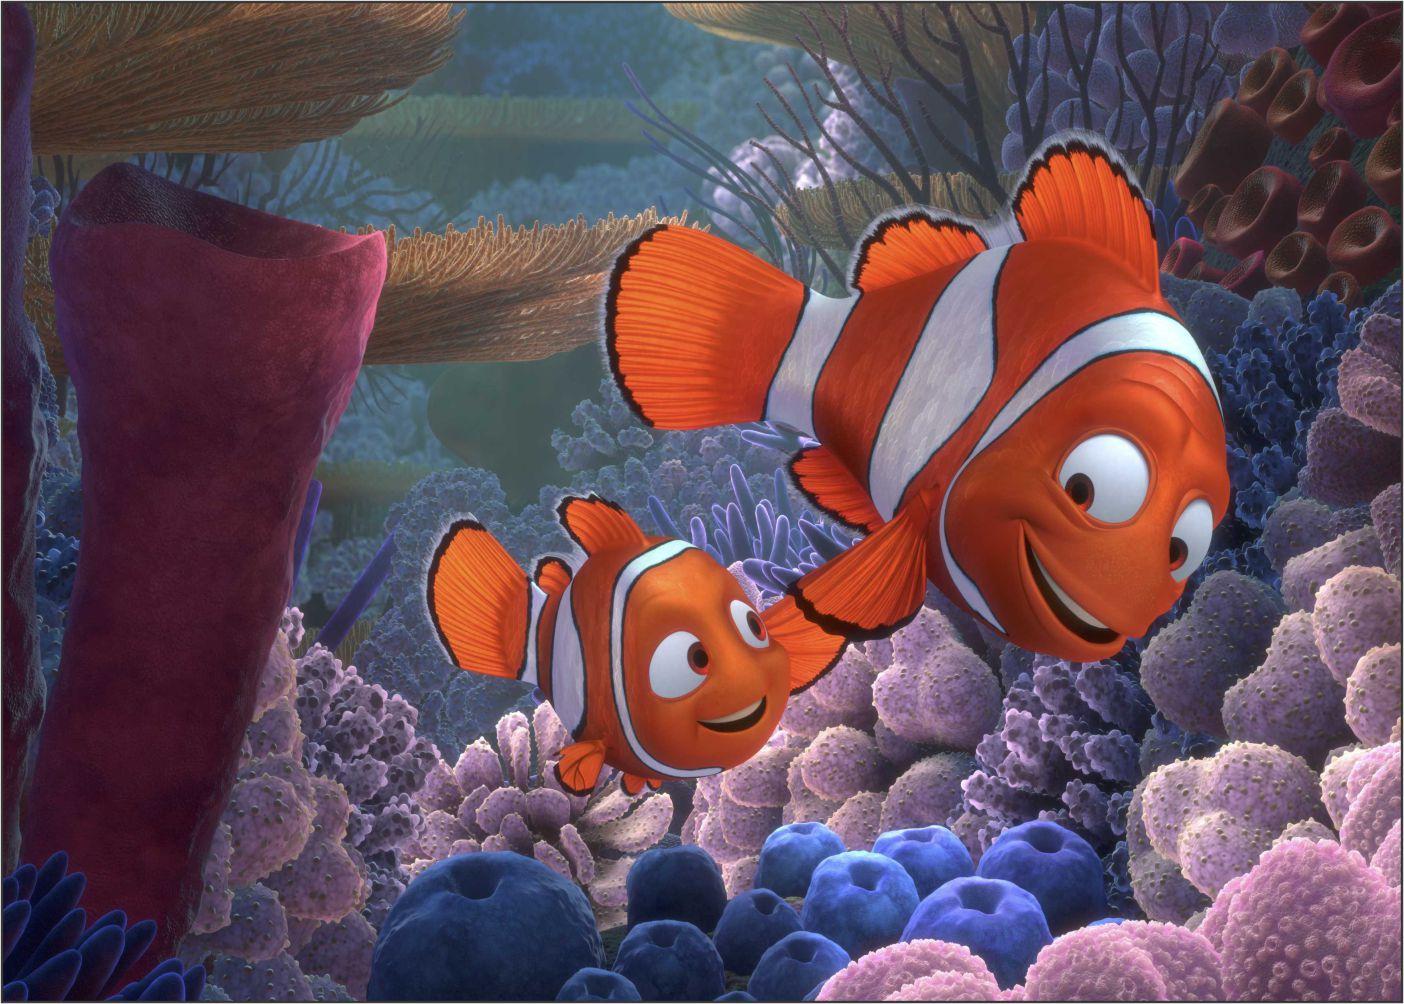 Papel de Parede 3D Nemo 0004 - Adesivos de Parede  - Paredes Decoradas